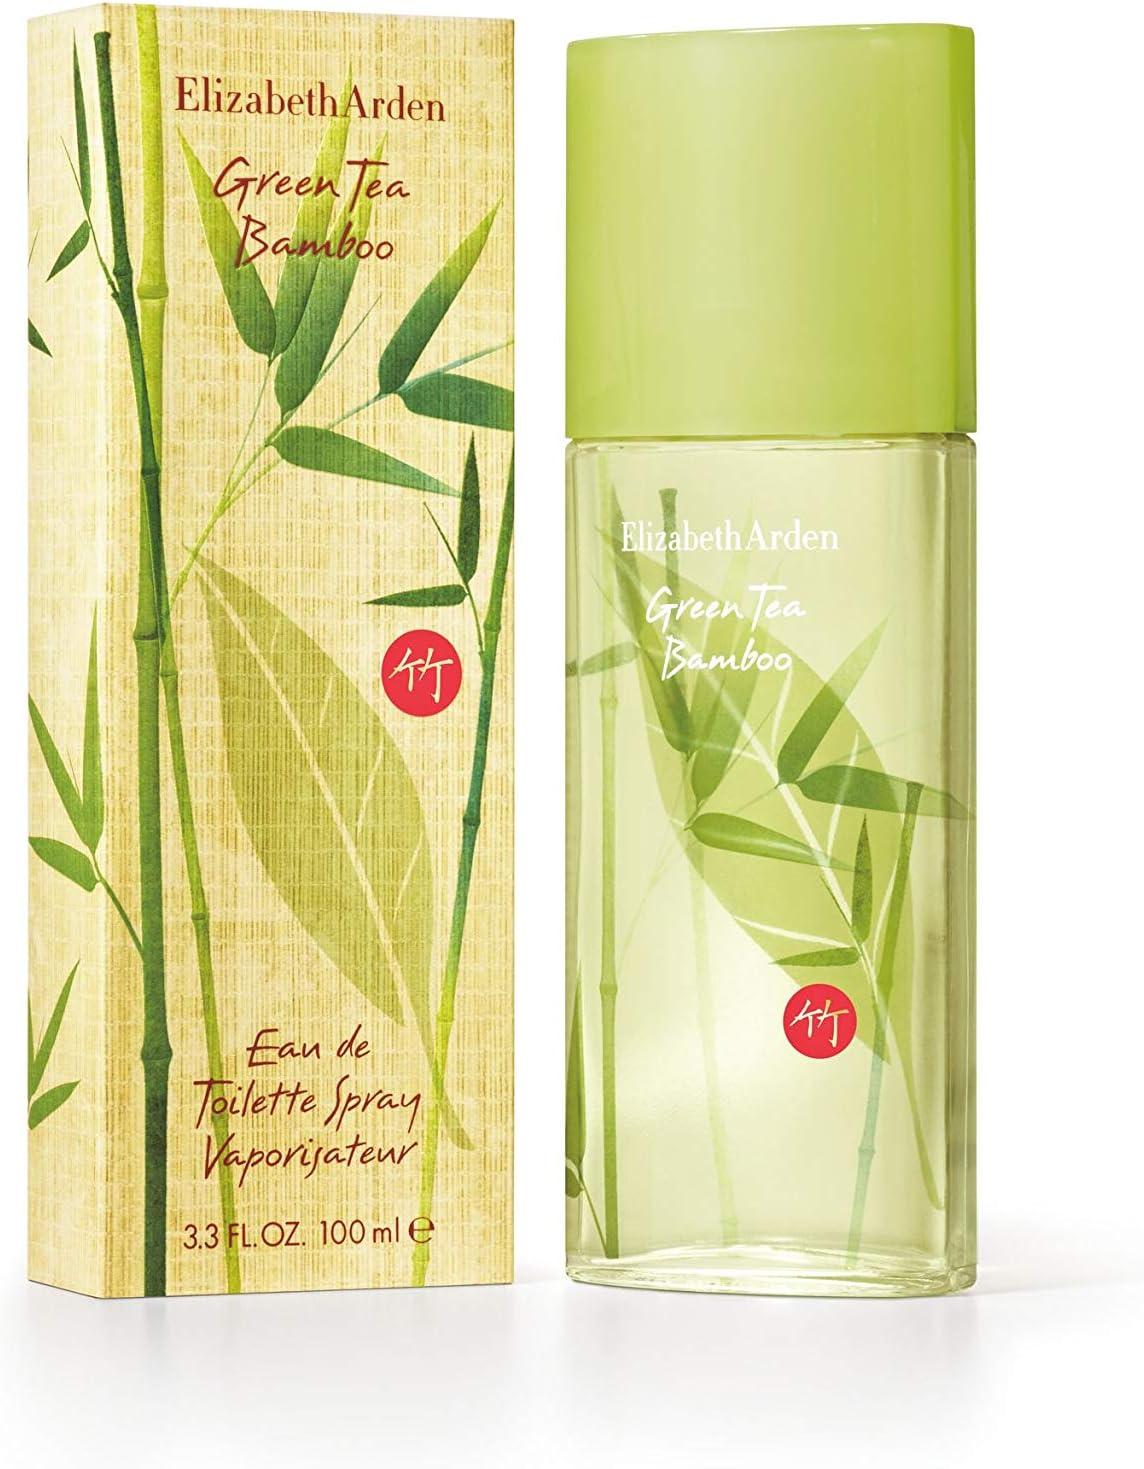 Elizabeth Arden Green Tea Bamboo Eau De Toilette 100 Ml 1 Unidad 100 g